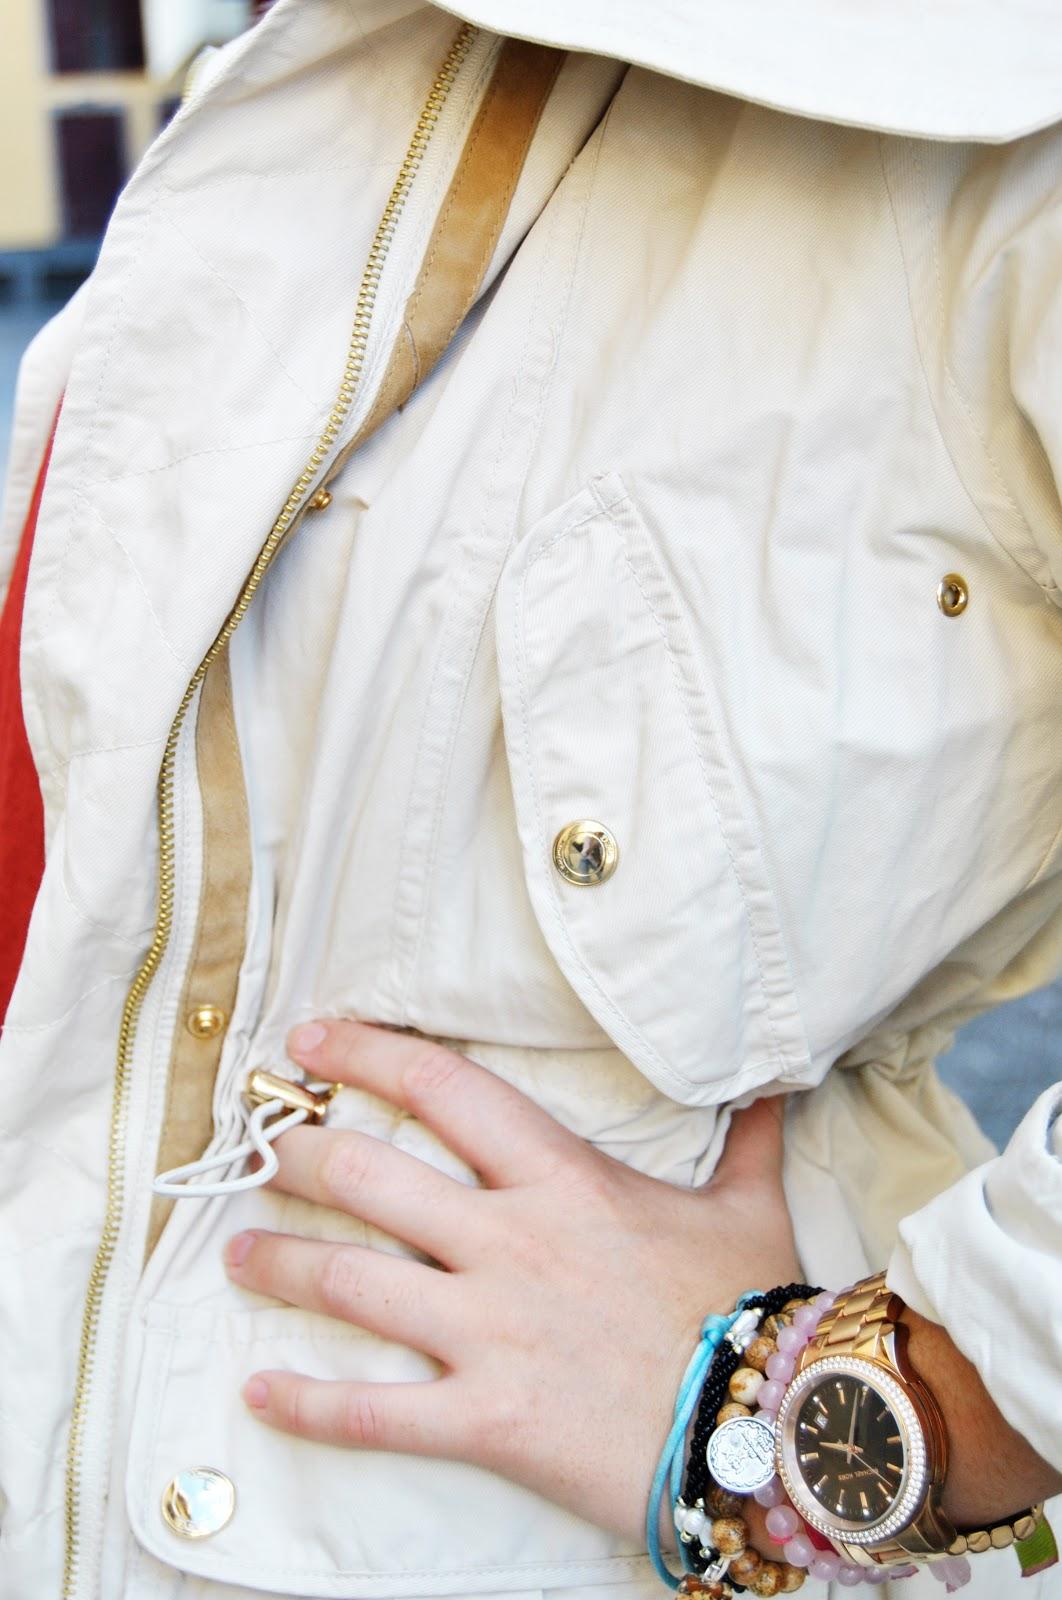 nery hdez, aviator style, parka, white pants